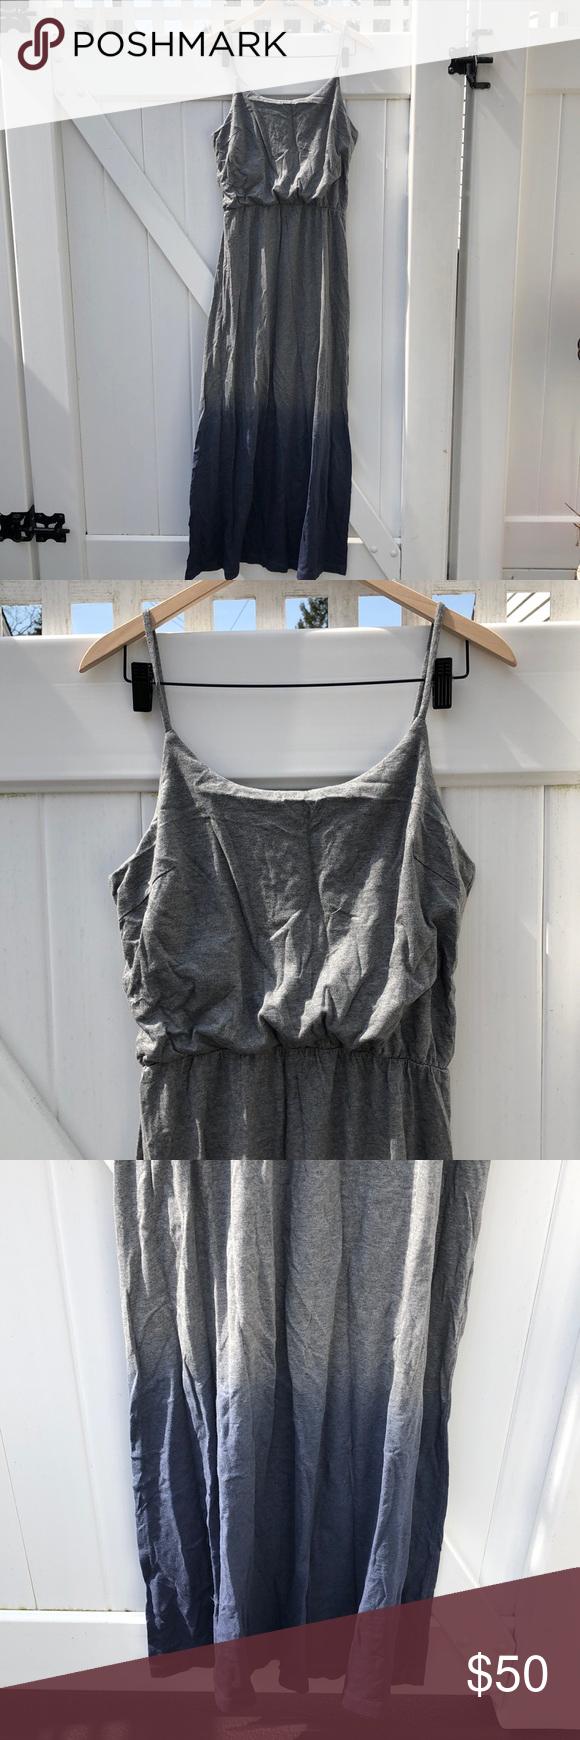 Gap Maxi Dress In Dip Dye Grey Blue Jersey Gap Maxi Dress Maxi Jersey Dress Maxi Dress [ 1740 x 580 Pixel ]